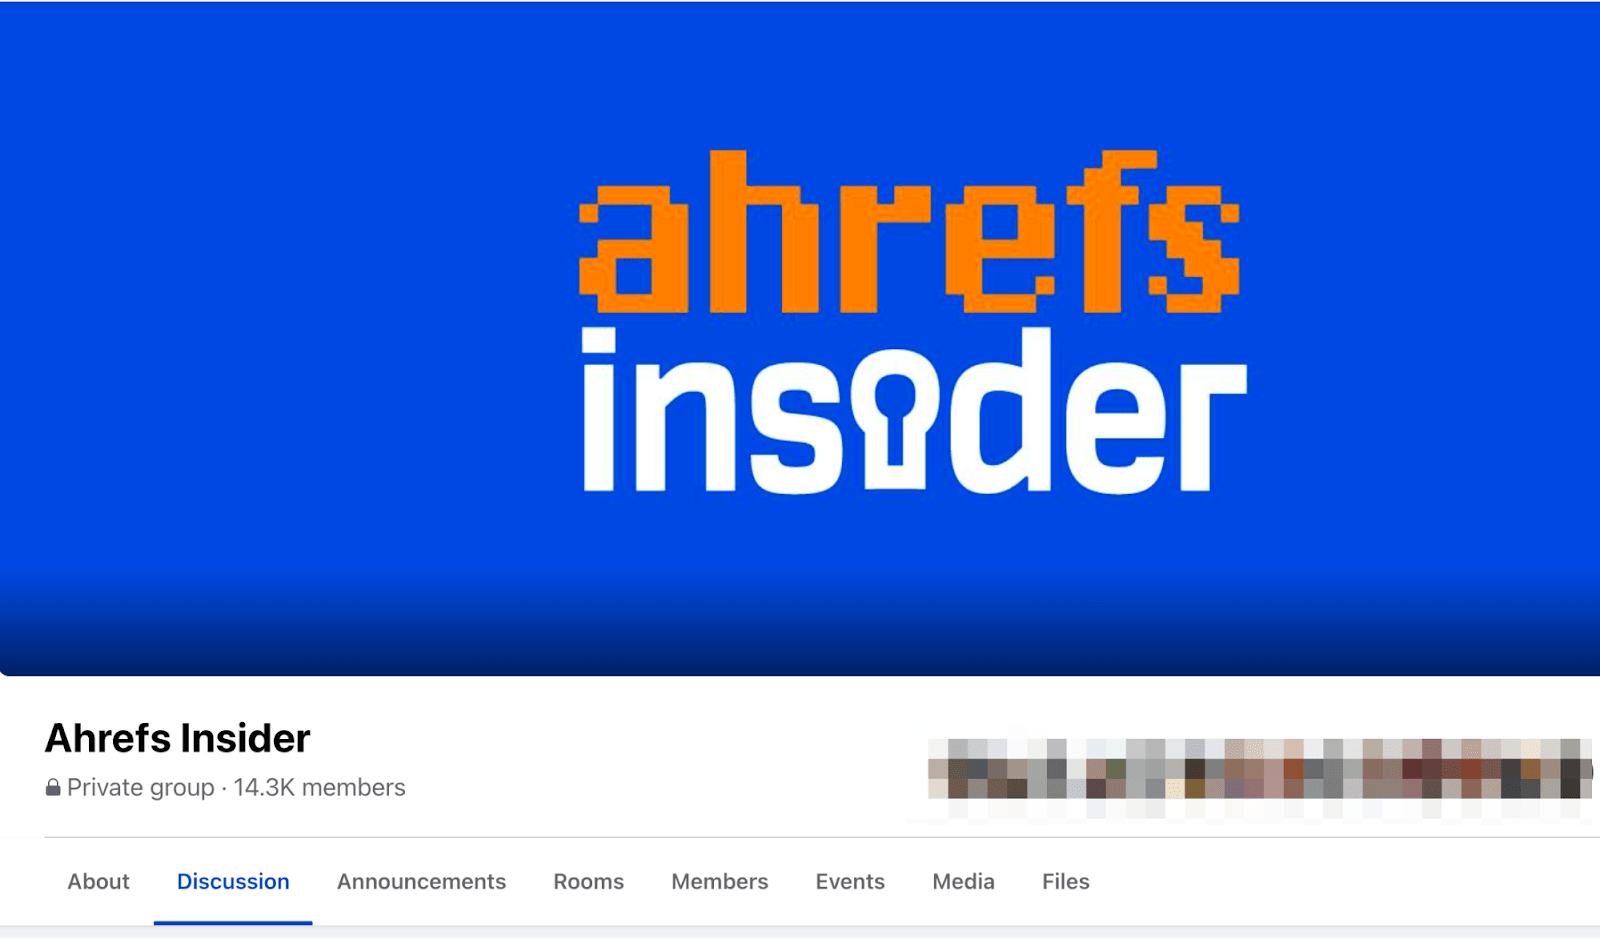 23 ahrefs insider